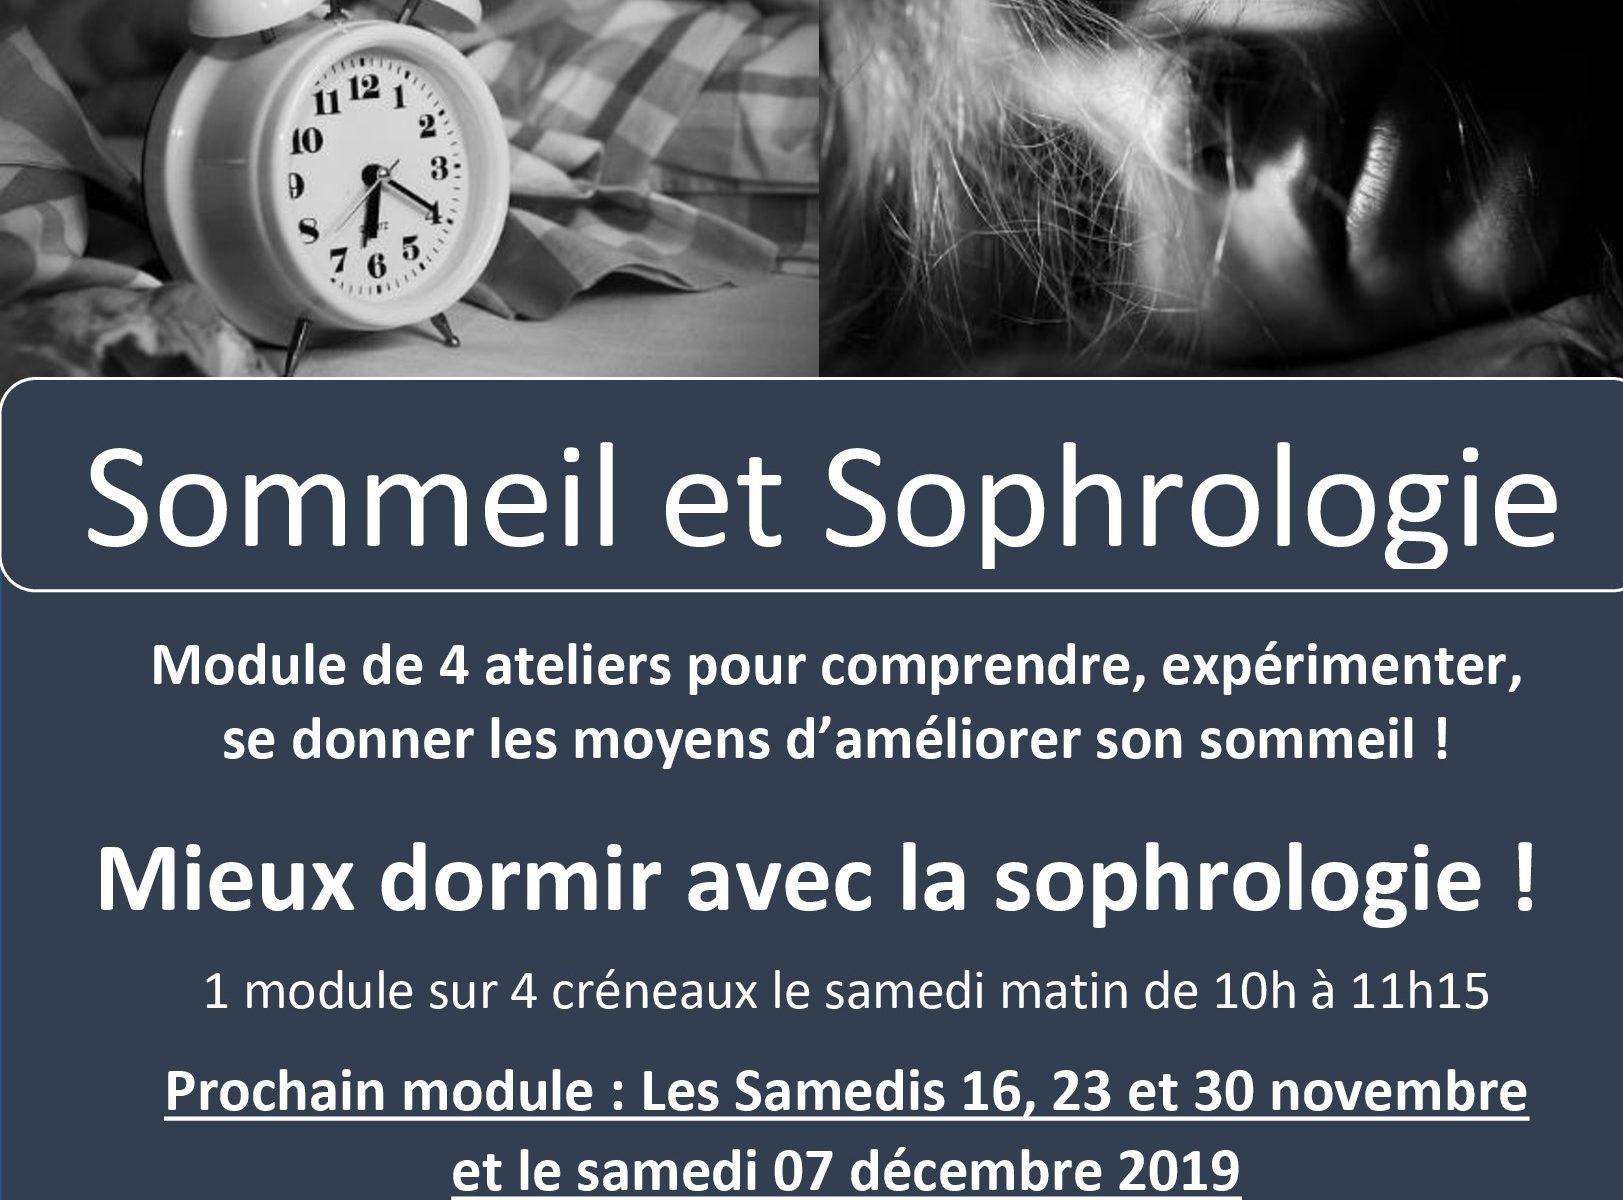 Sommeil et Sophrologie